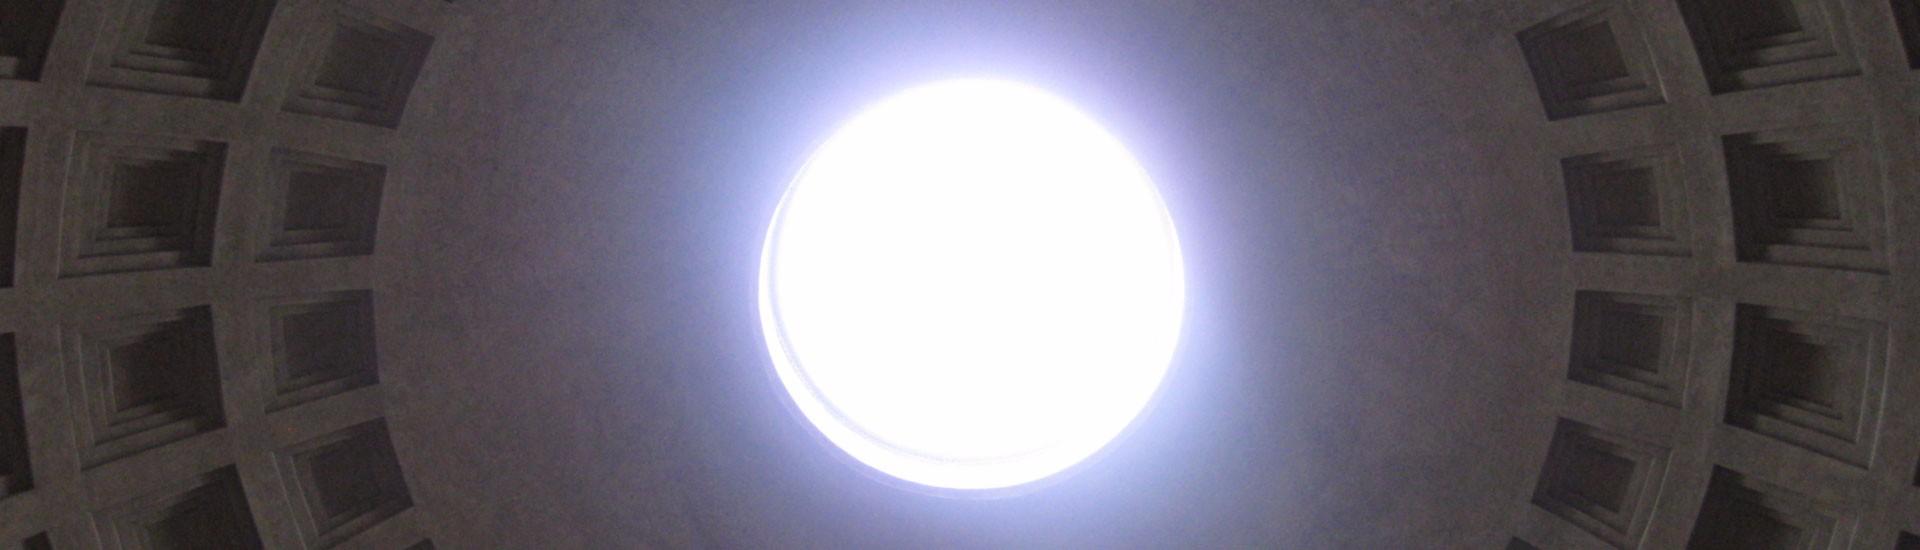 008-momentidiroma-pantheon